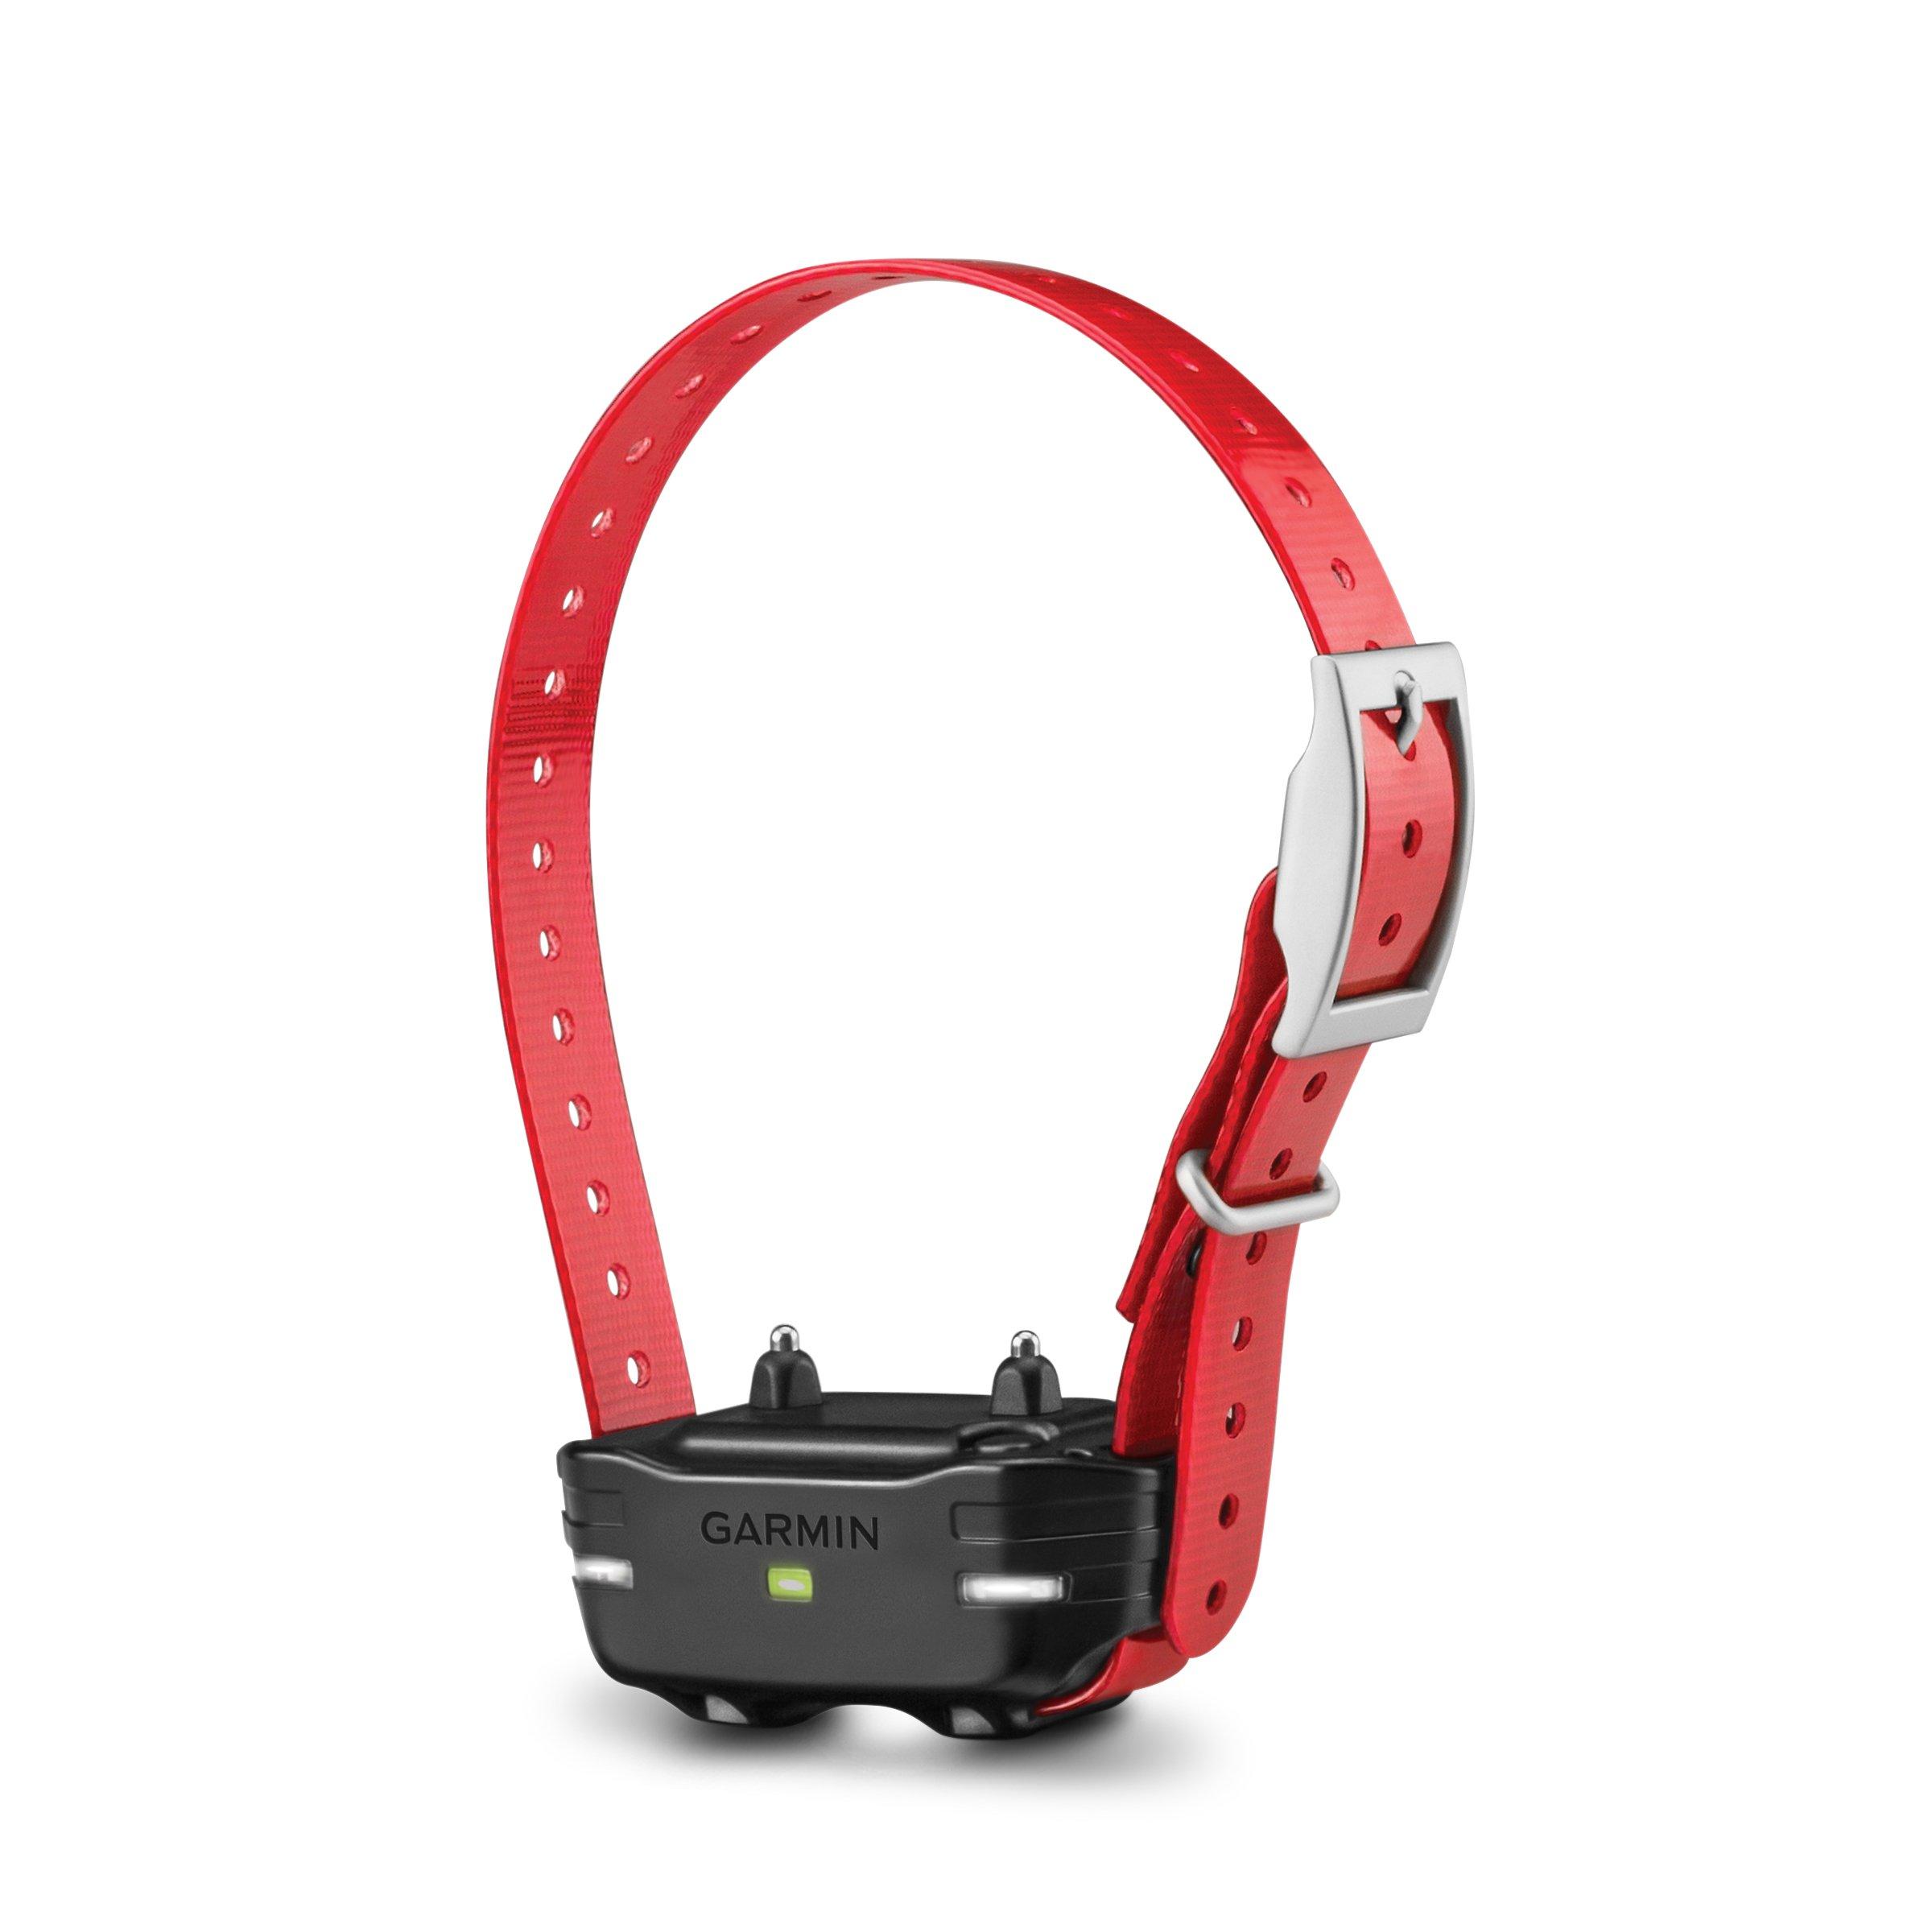 Garmin PT10 Dog Device Red Collar (Pro 70/Pro 550)